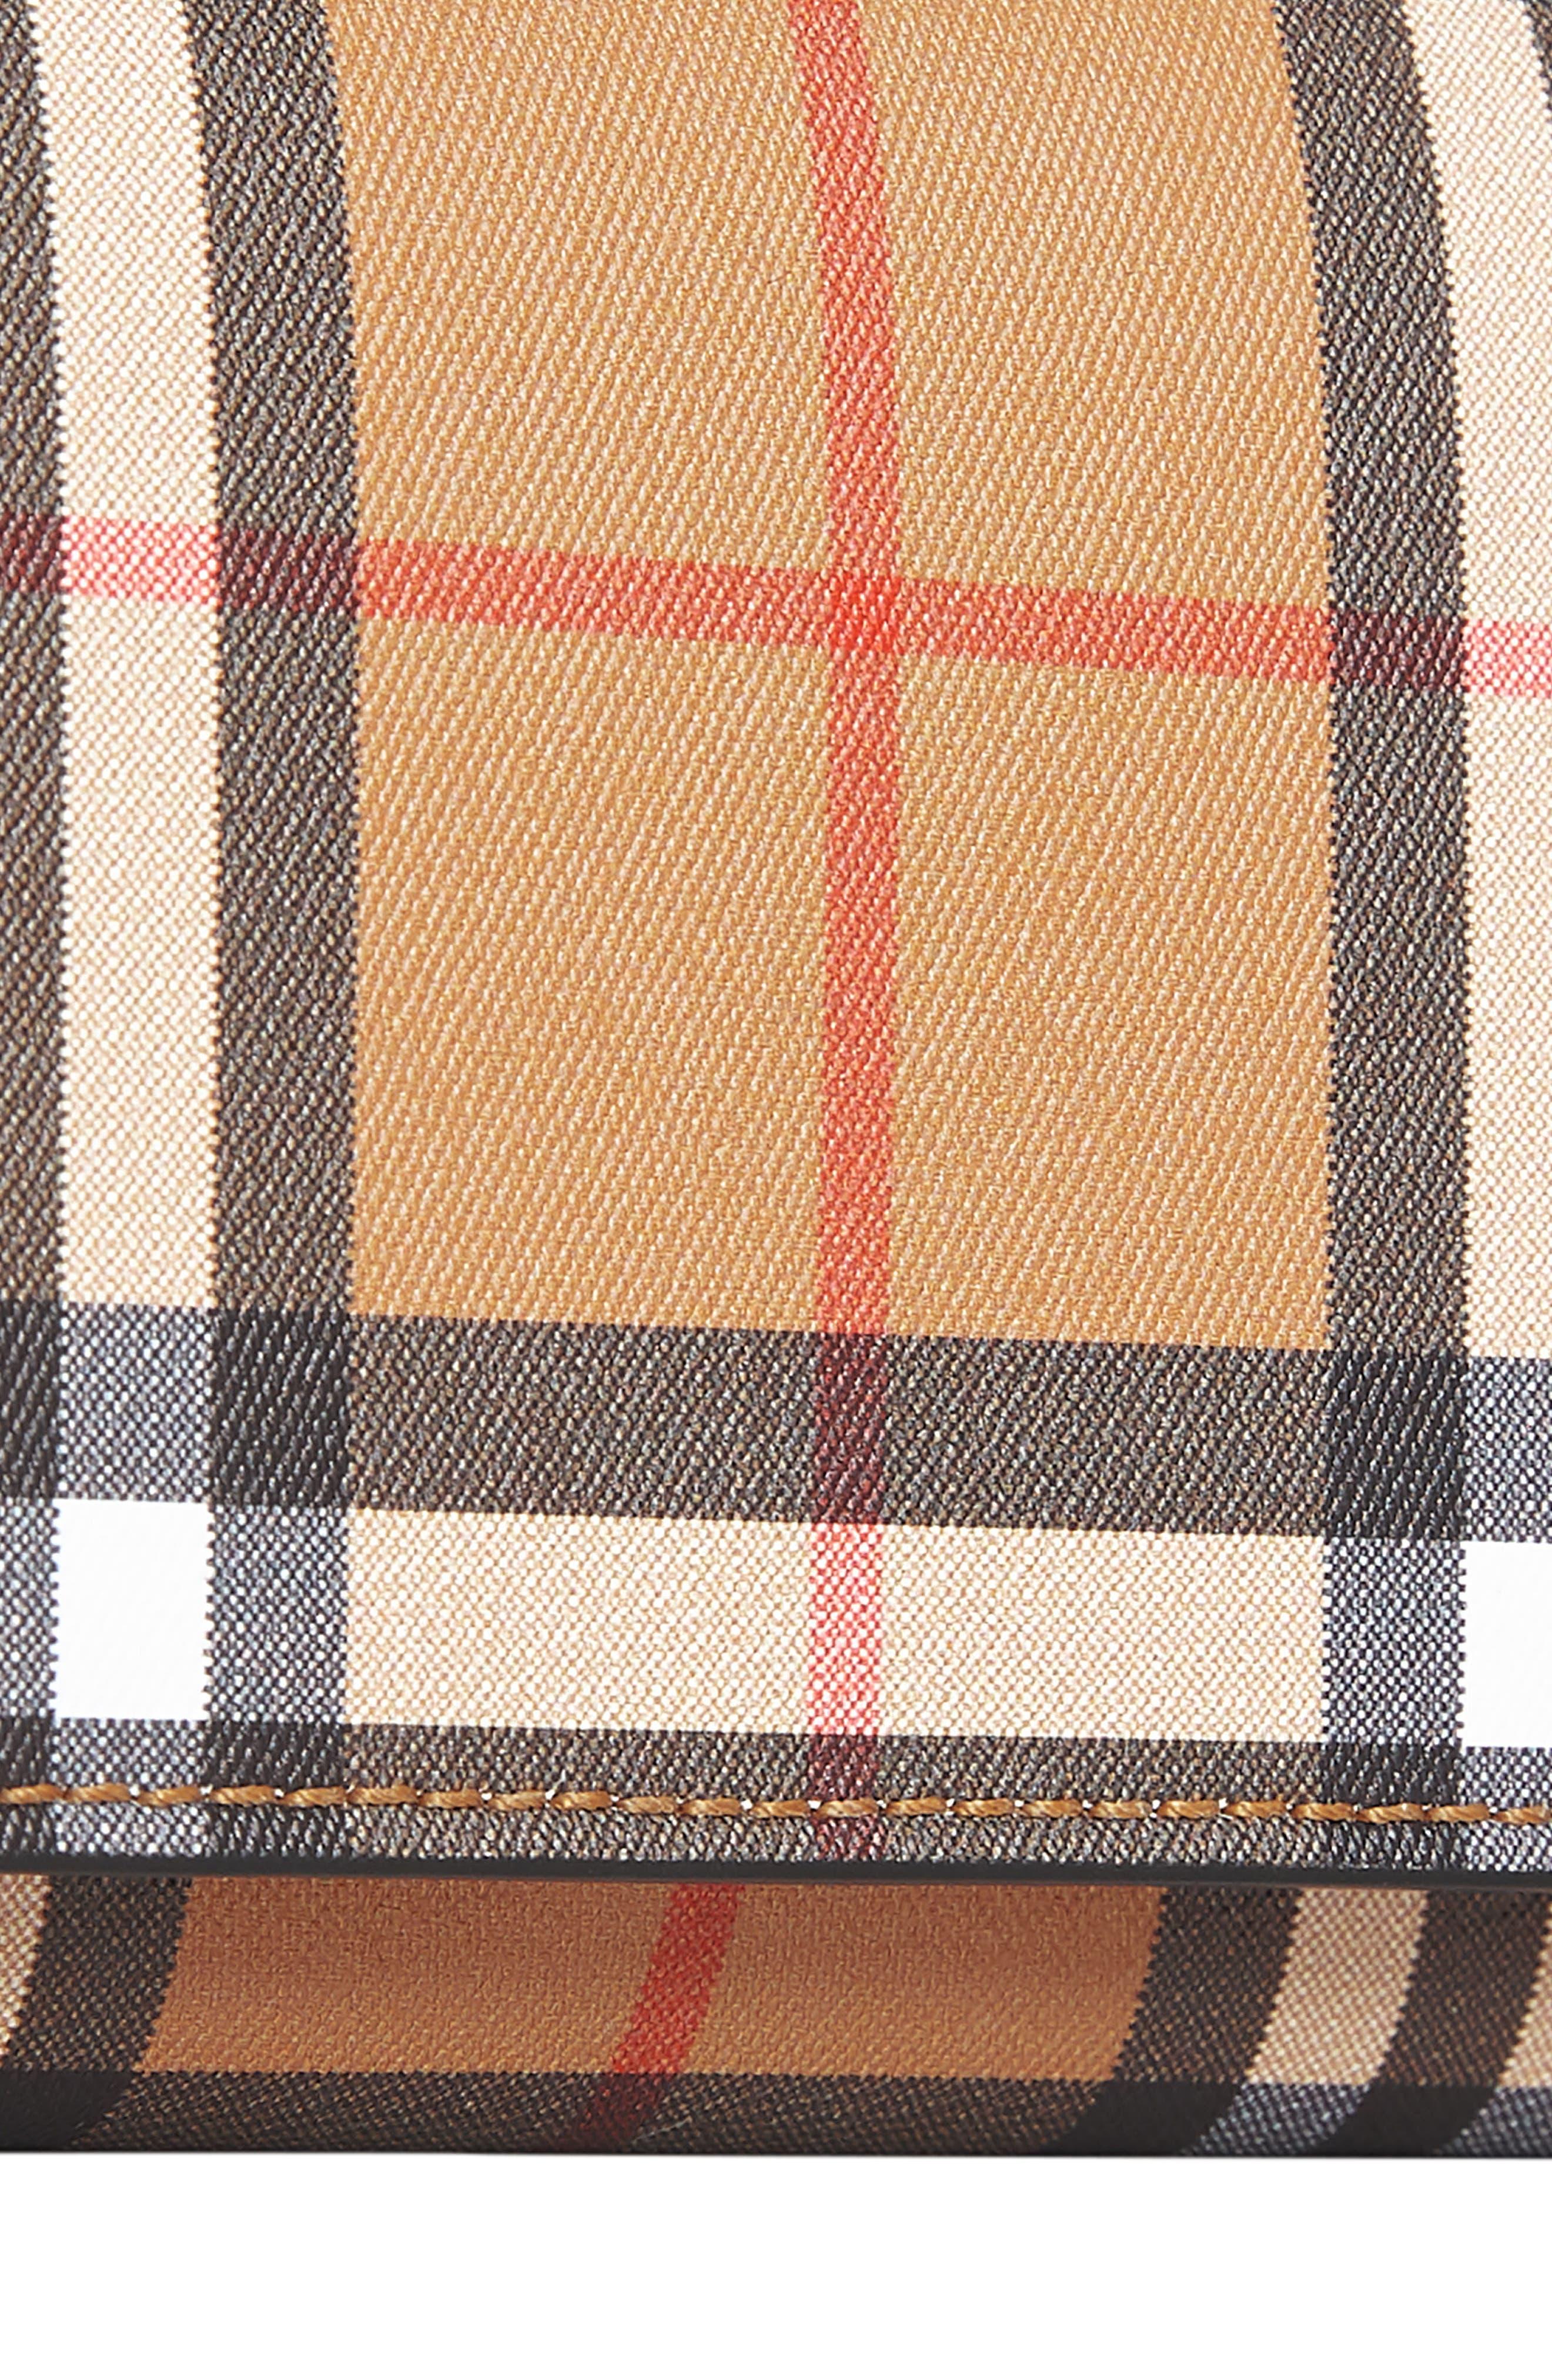 Kenton Check Wallet,                             Alternate thumbnail 6, color,                             Black